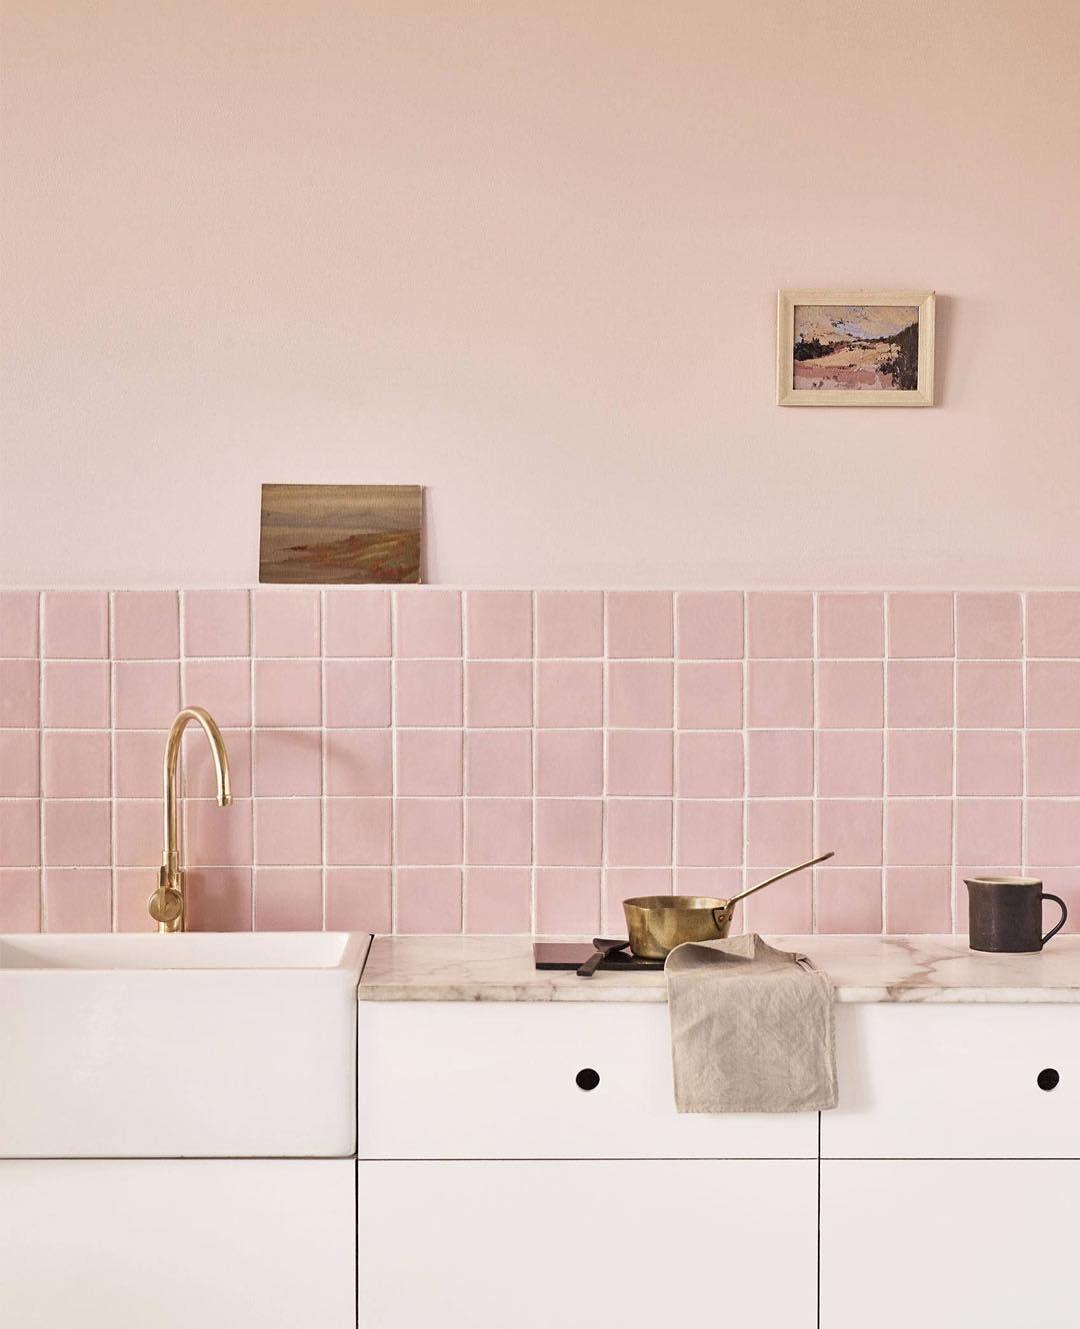 The Perfect Combination Of Colour Size And Artisan Style Combines To Make Our Campinola Tile Just Kitchen Splashback Splashback Tiles Kitchen Splashback Tiles